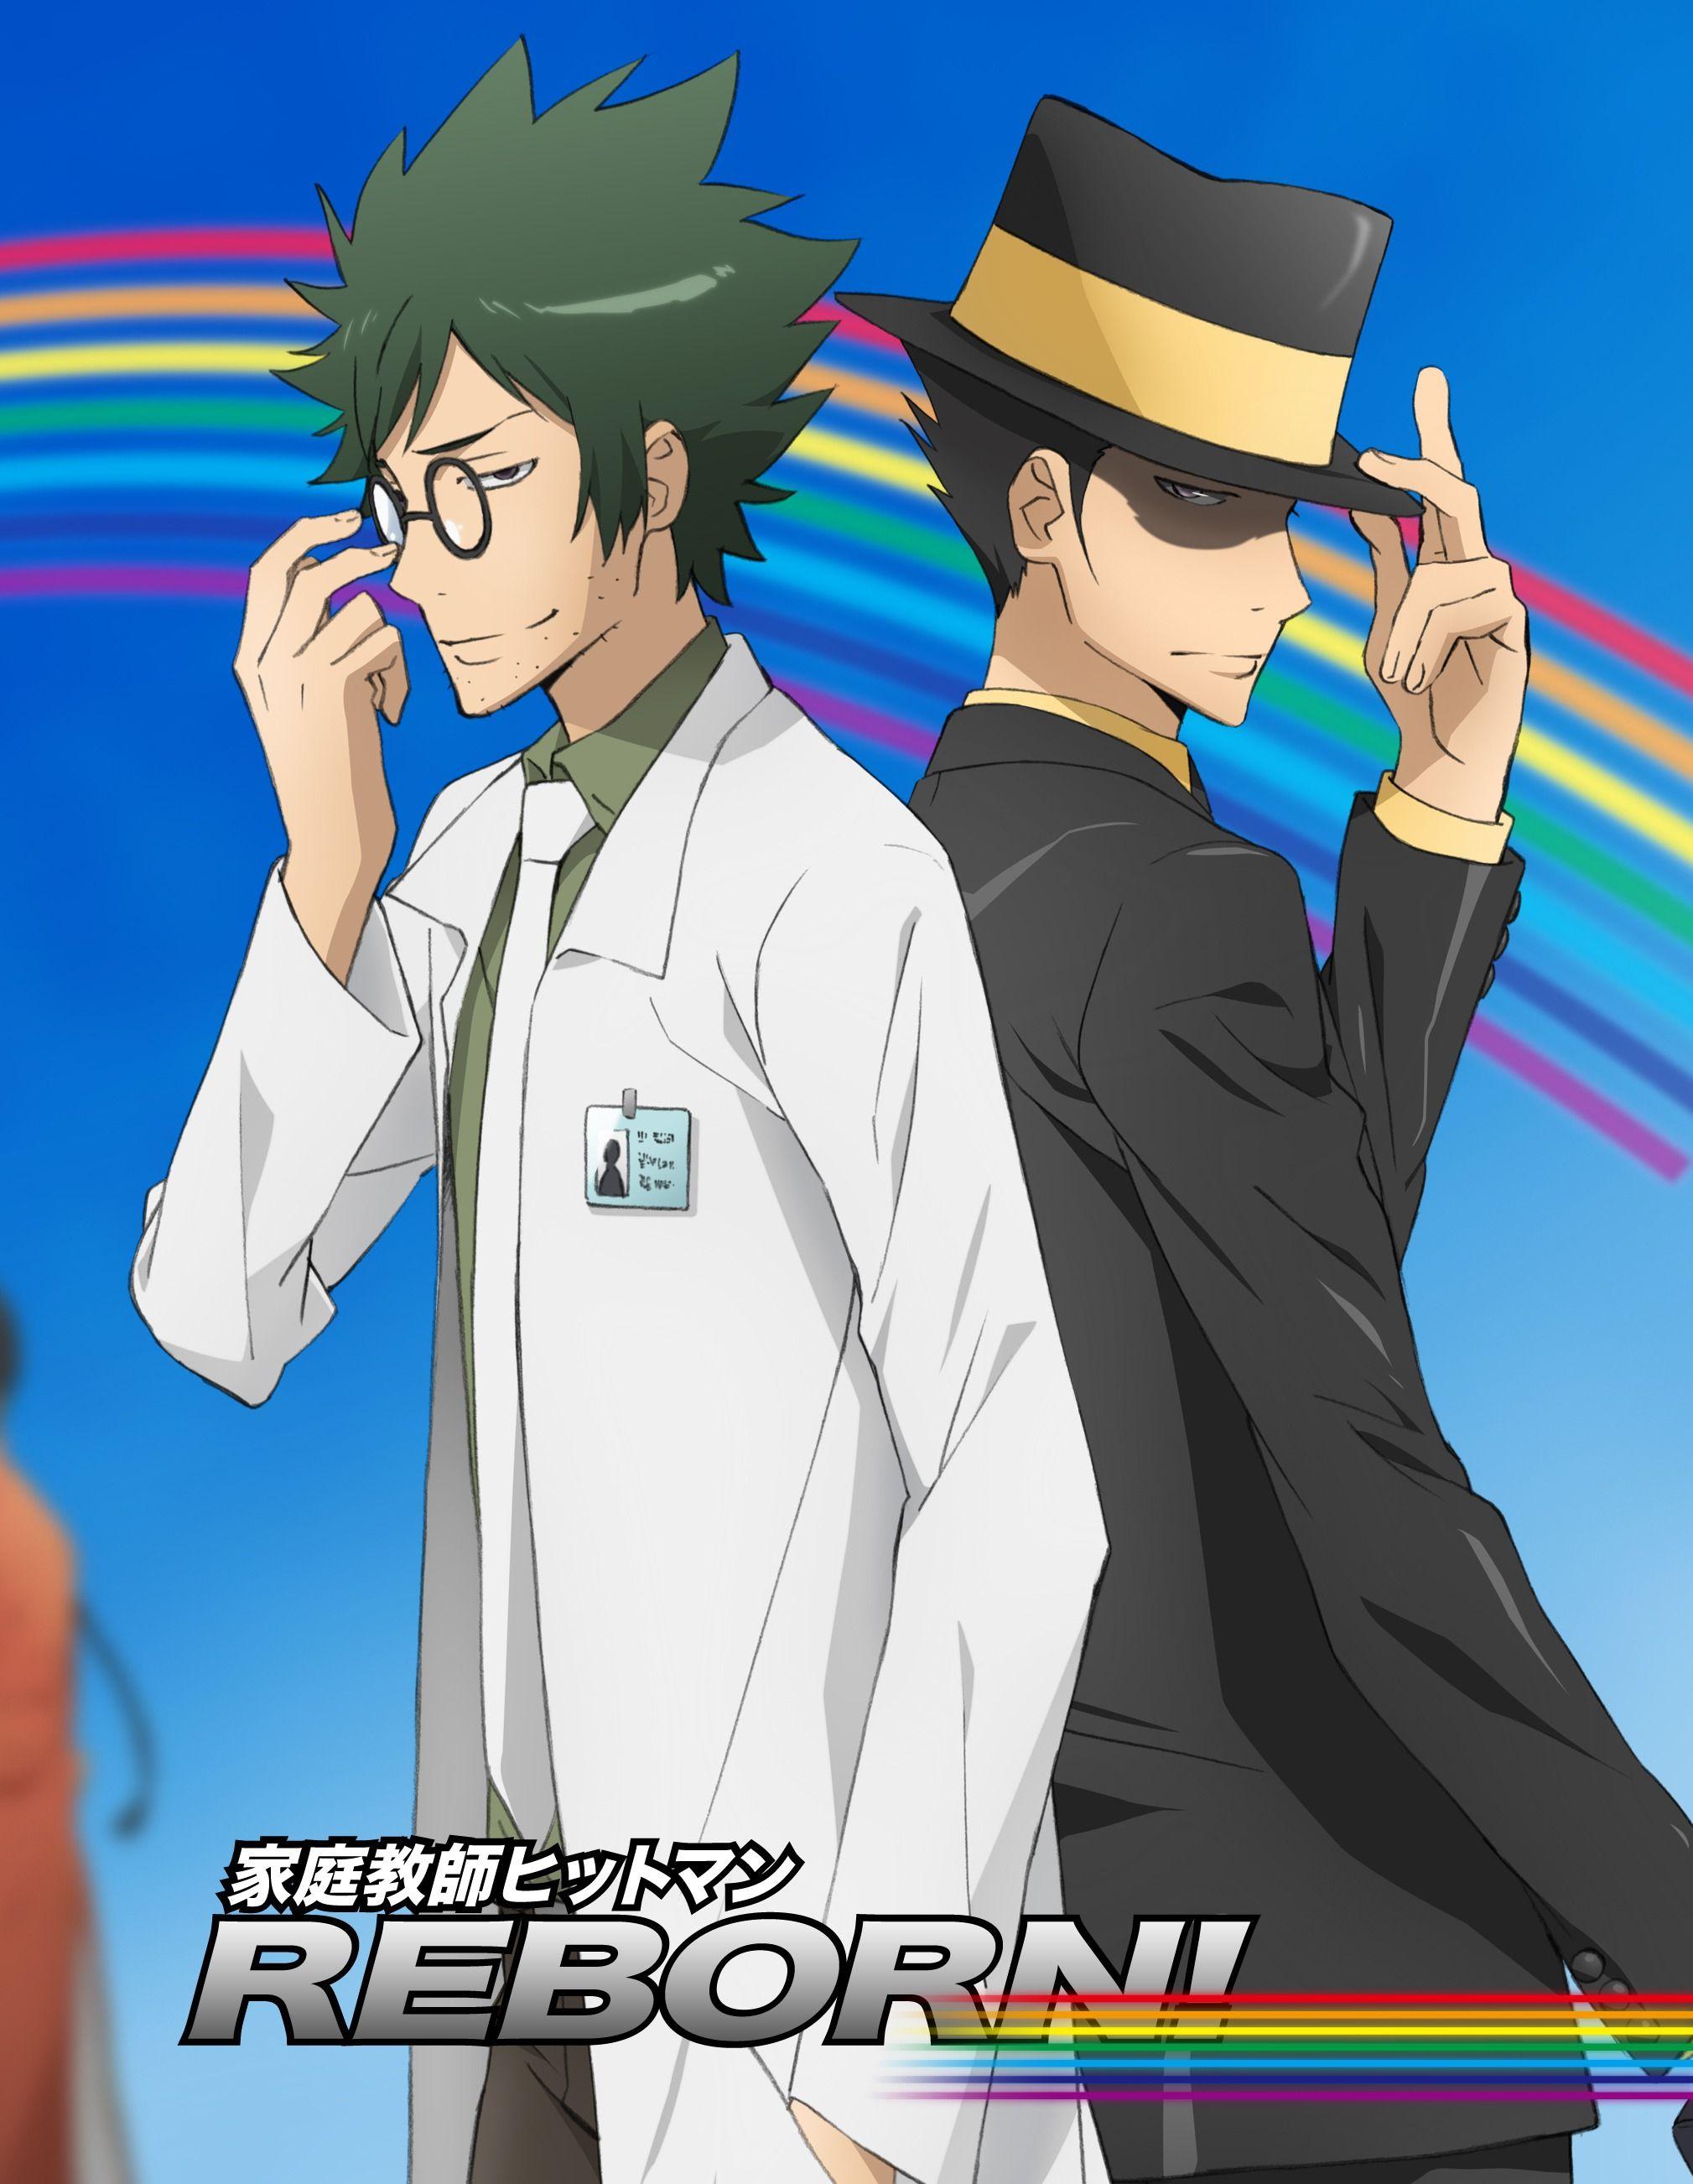 Anime Reborn Season 1 Tags Anime Tanaka Masayoshi Katekyo Hitman Reborn Verde Reborn Hitman Reborn Reborn Katekyo Hitman Hitman